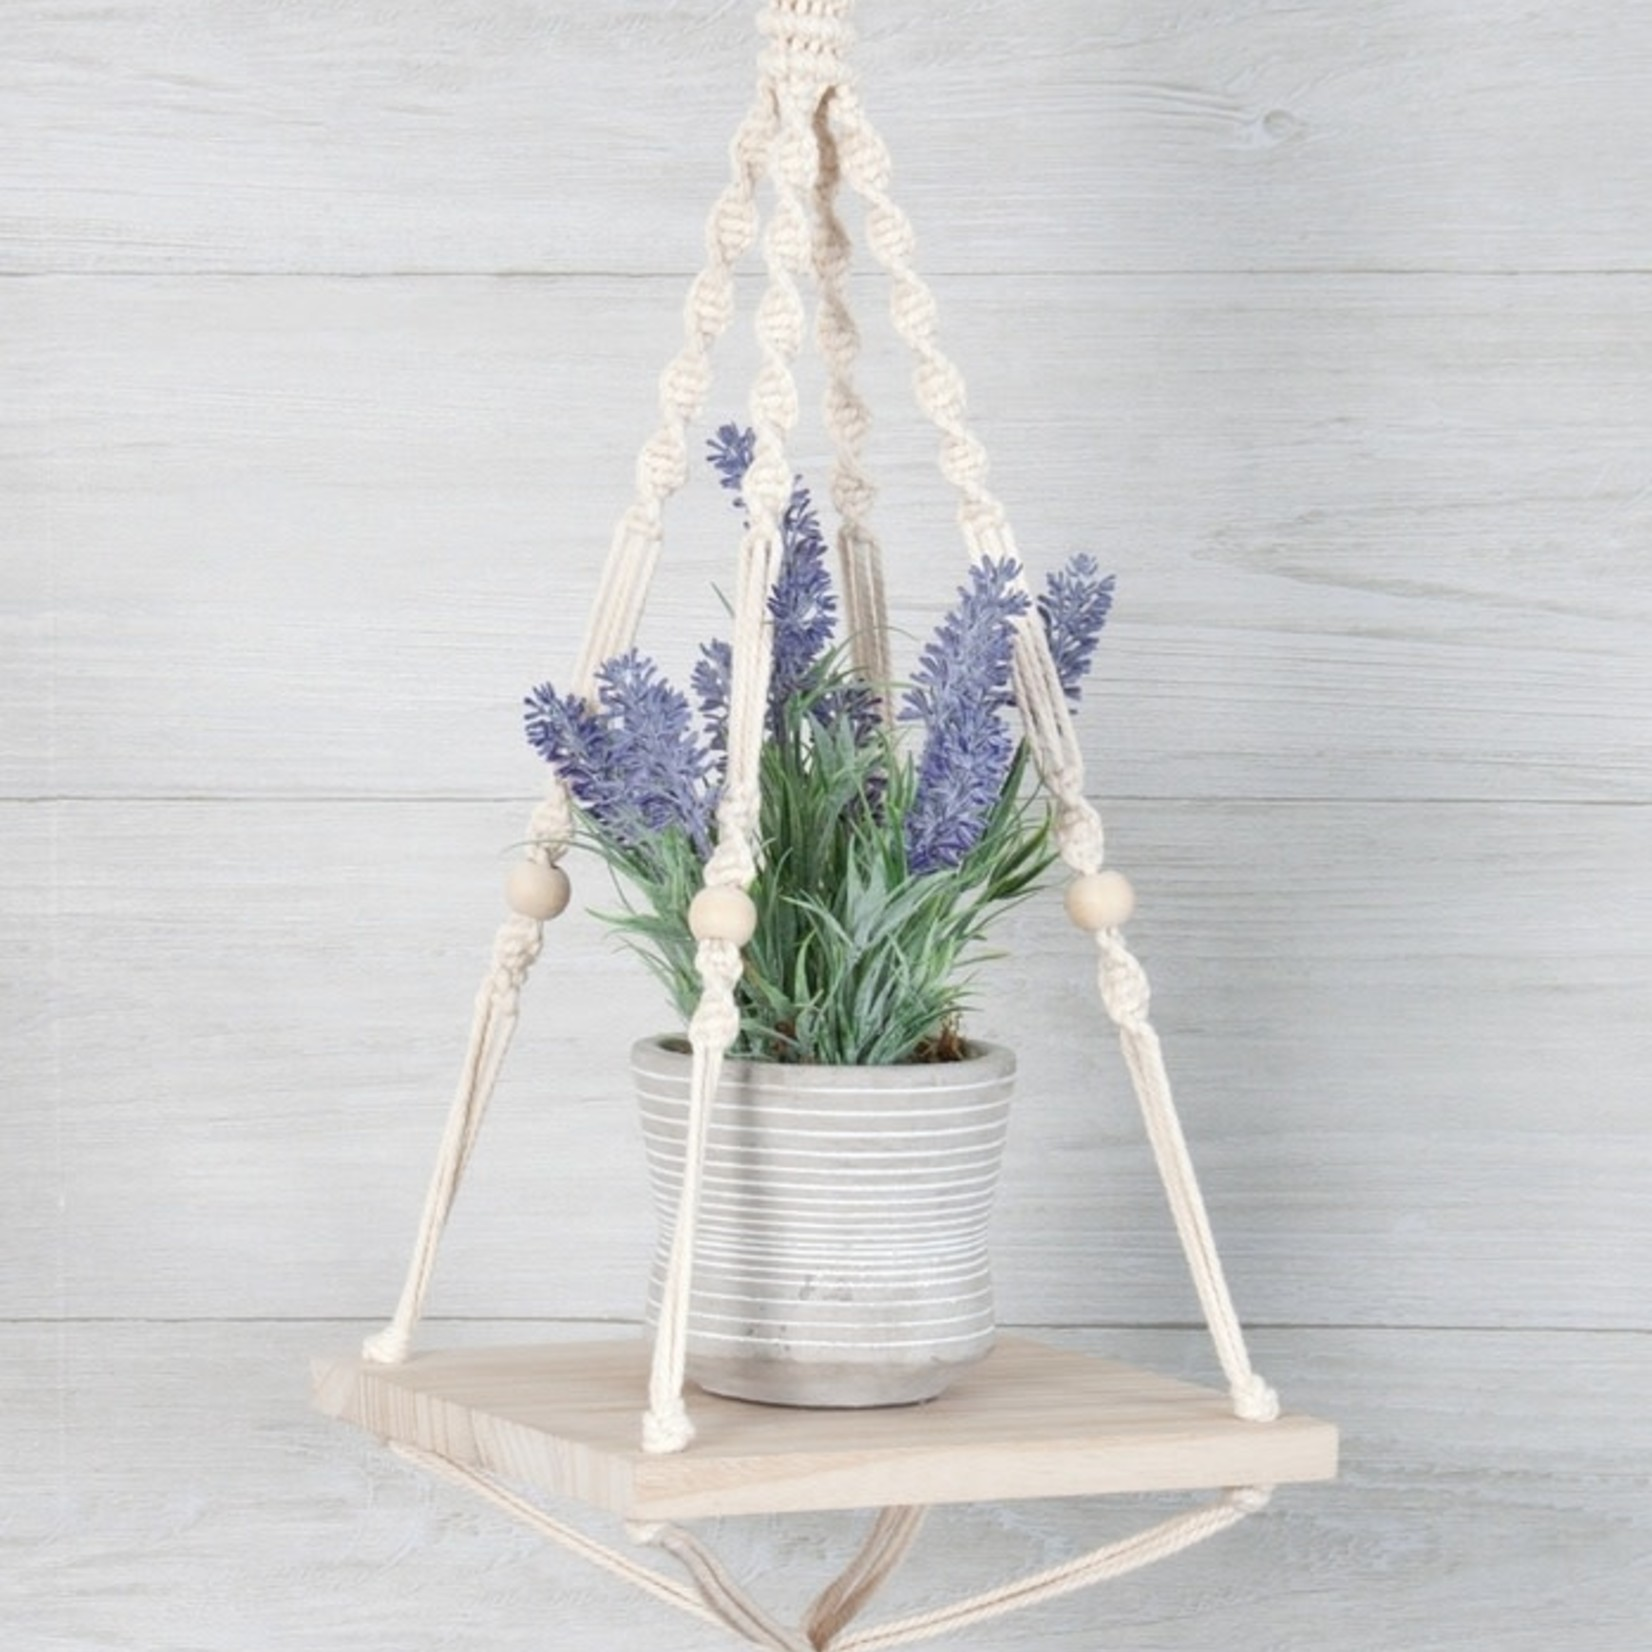 Solid Oak Inc Macrame Kit - Hanging Shelf - Square